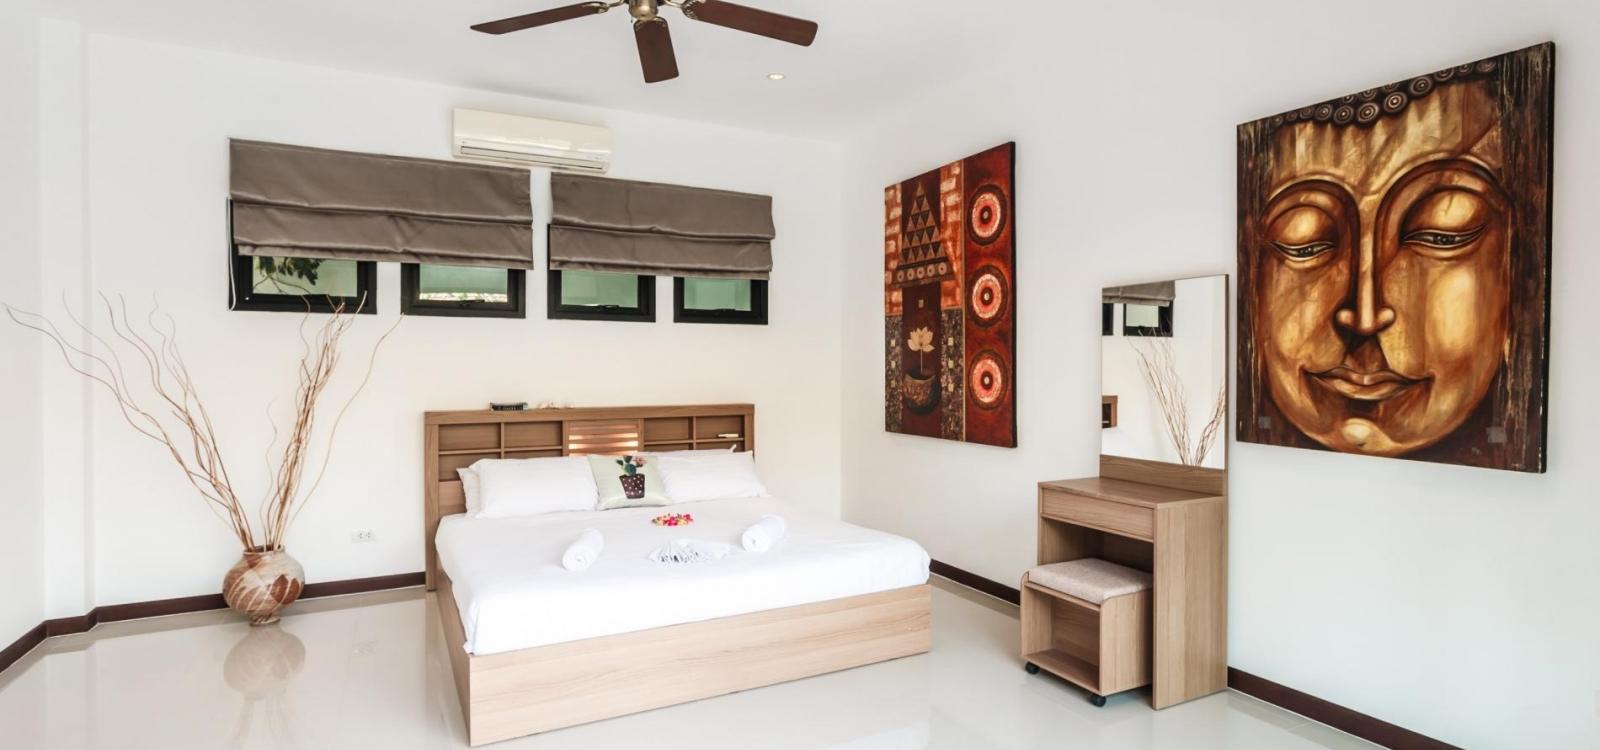 Frangipani Villa in Nai Harn - 5 bedroom private pool with garden and pizza oven